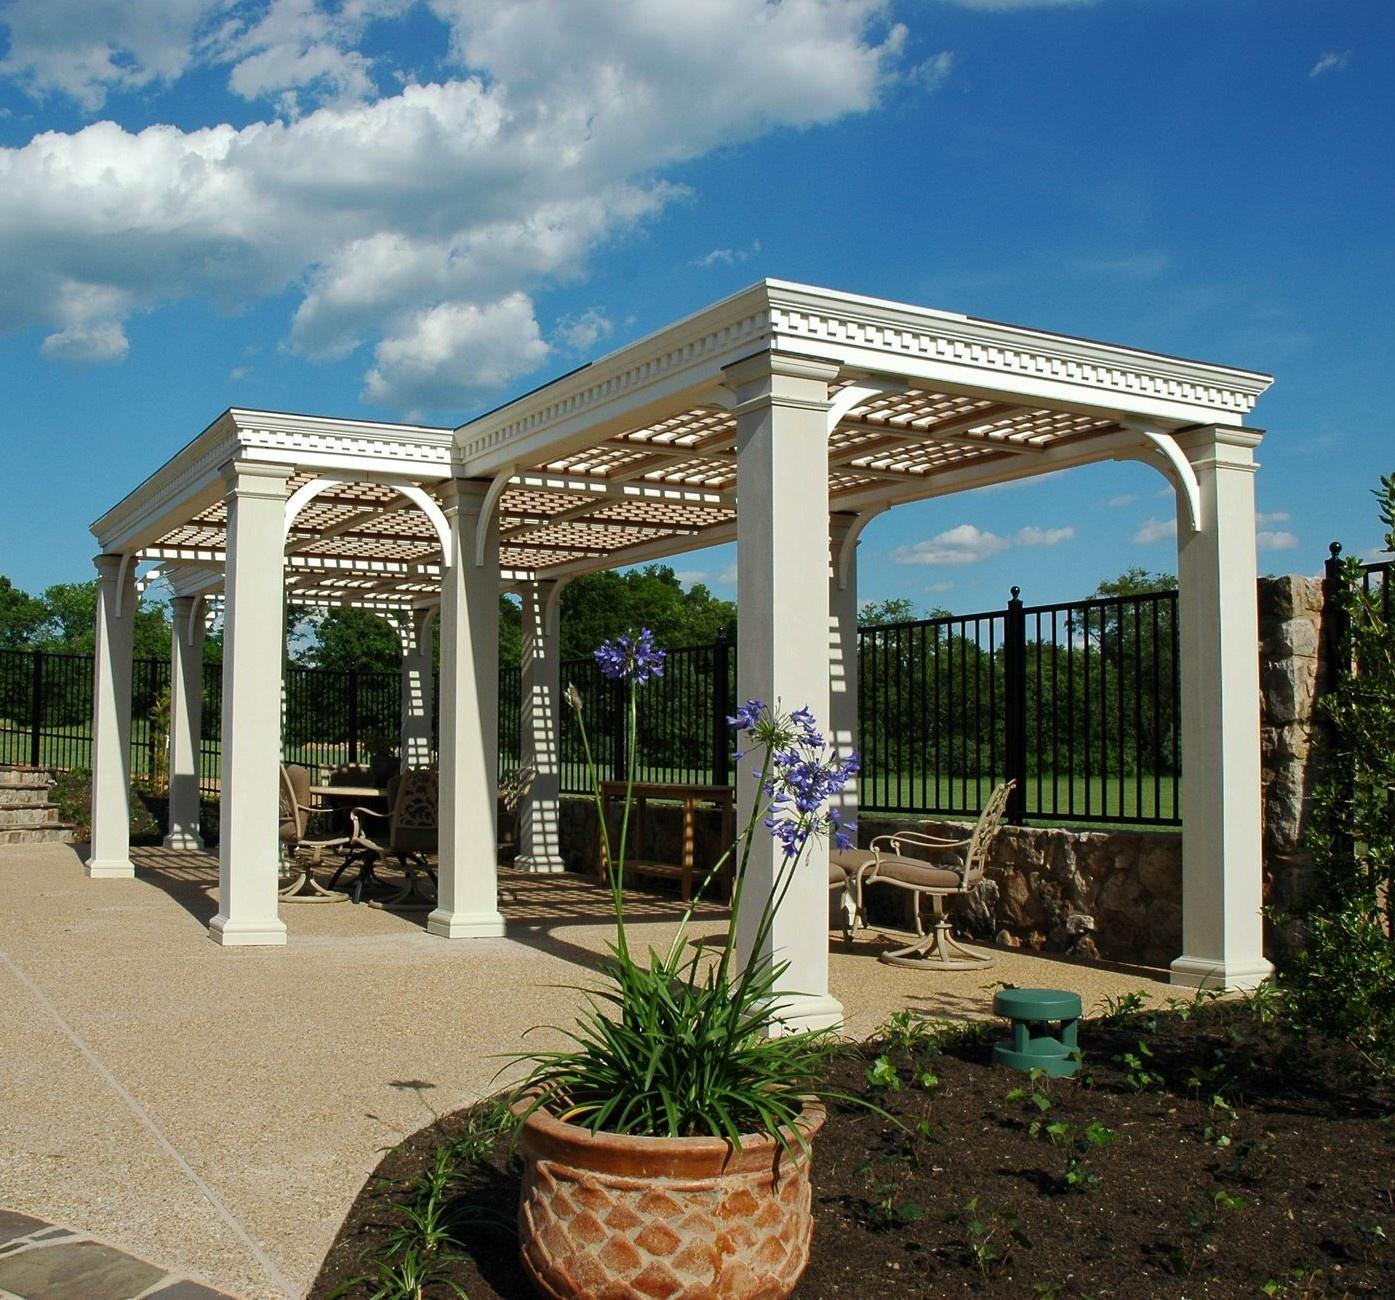 Pool pergola with square fiberglass columns and trellis for shade